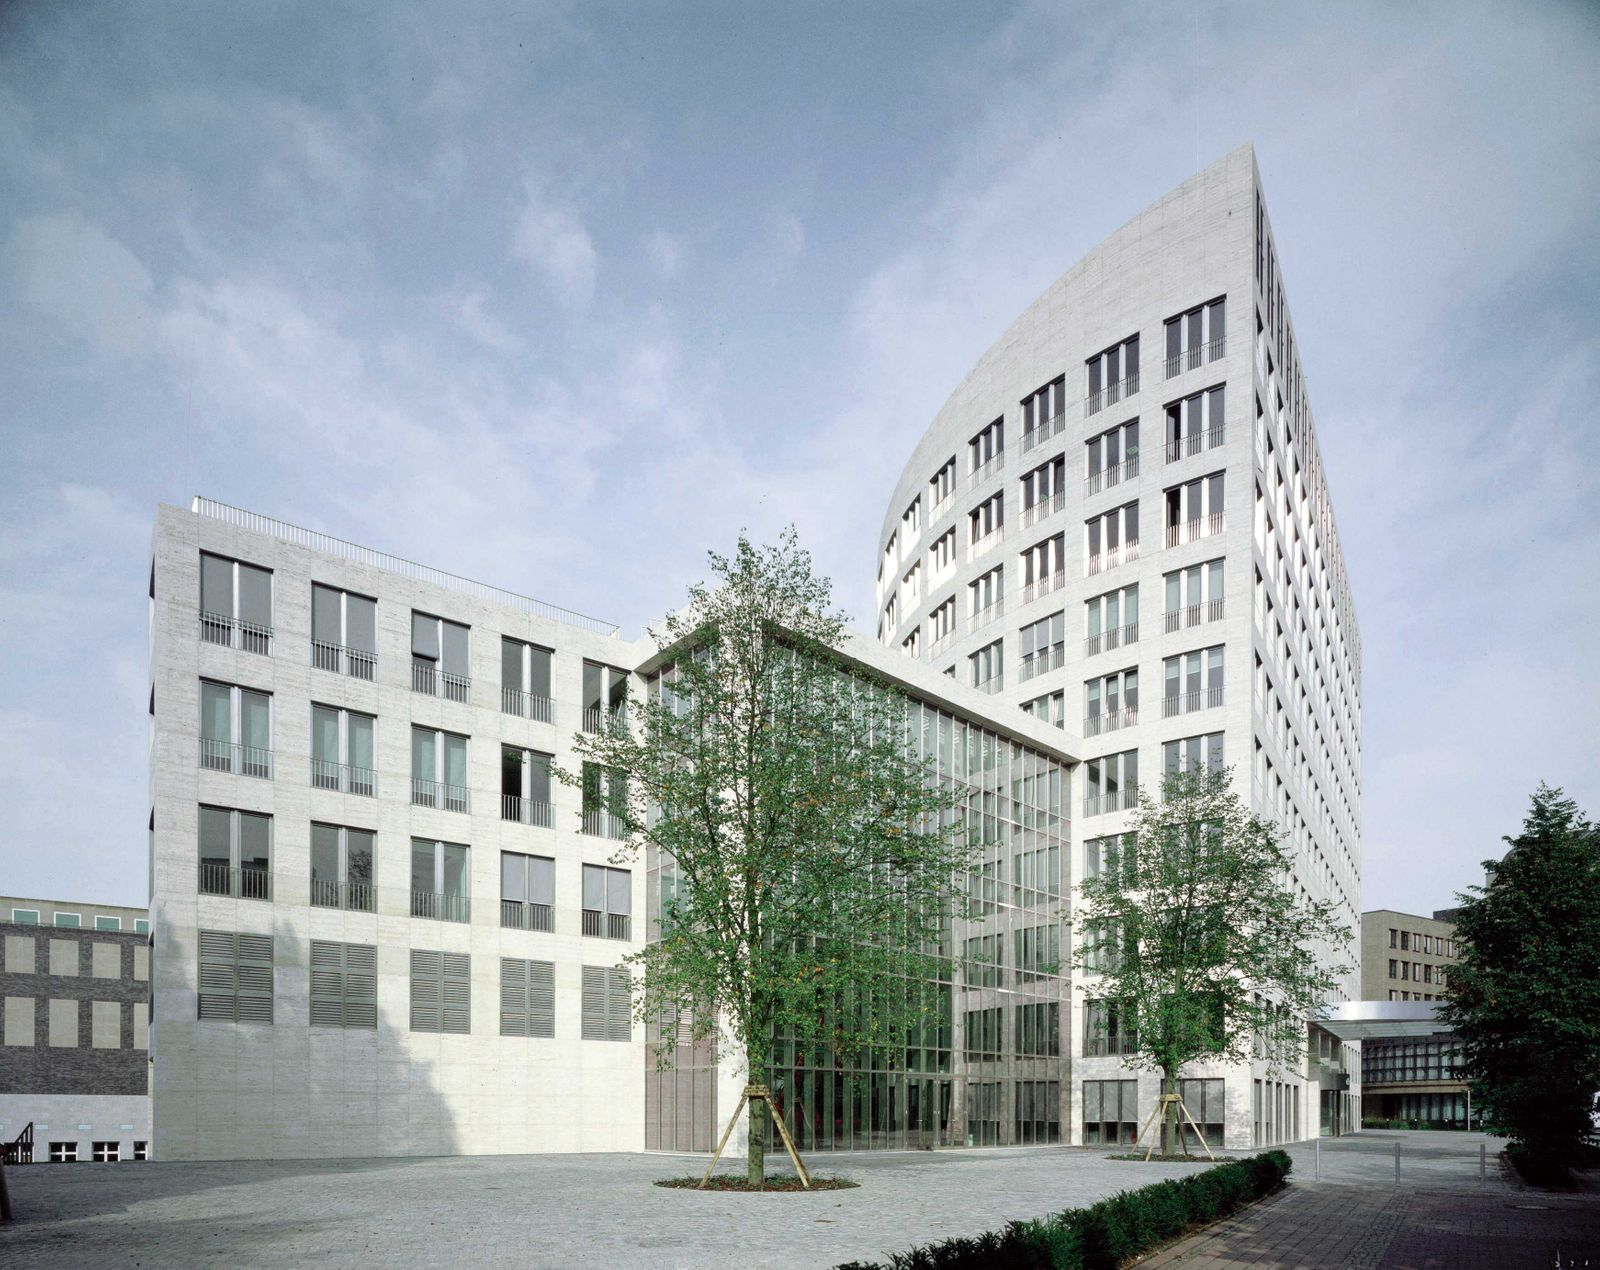 E.ON AG / Eon Holding / Düsseldorf